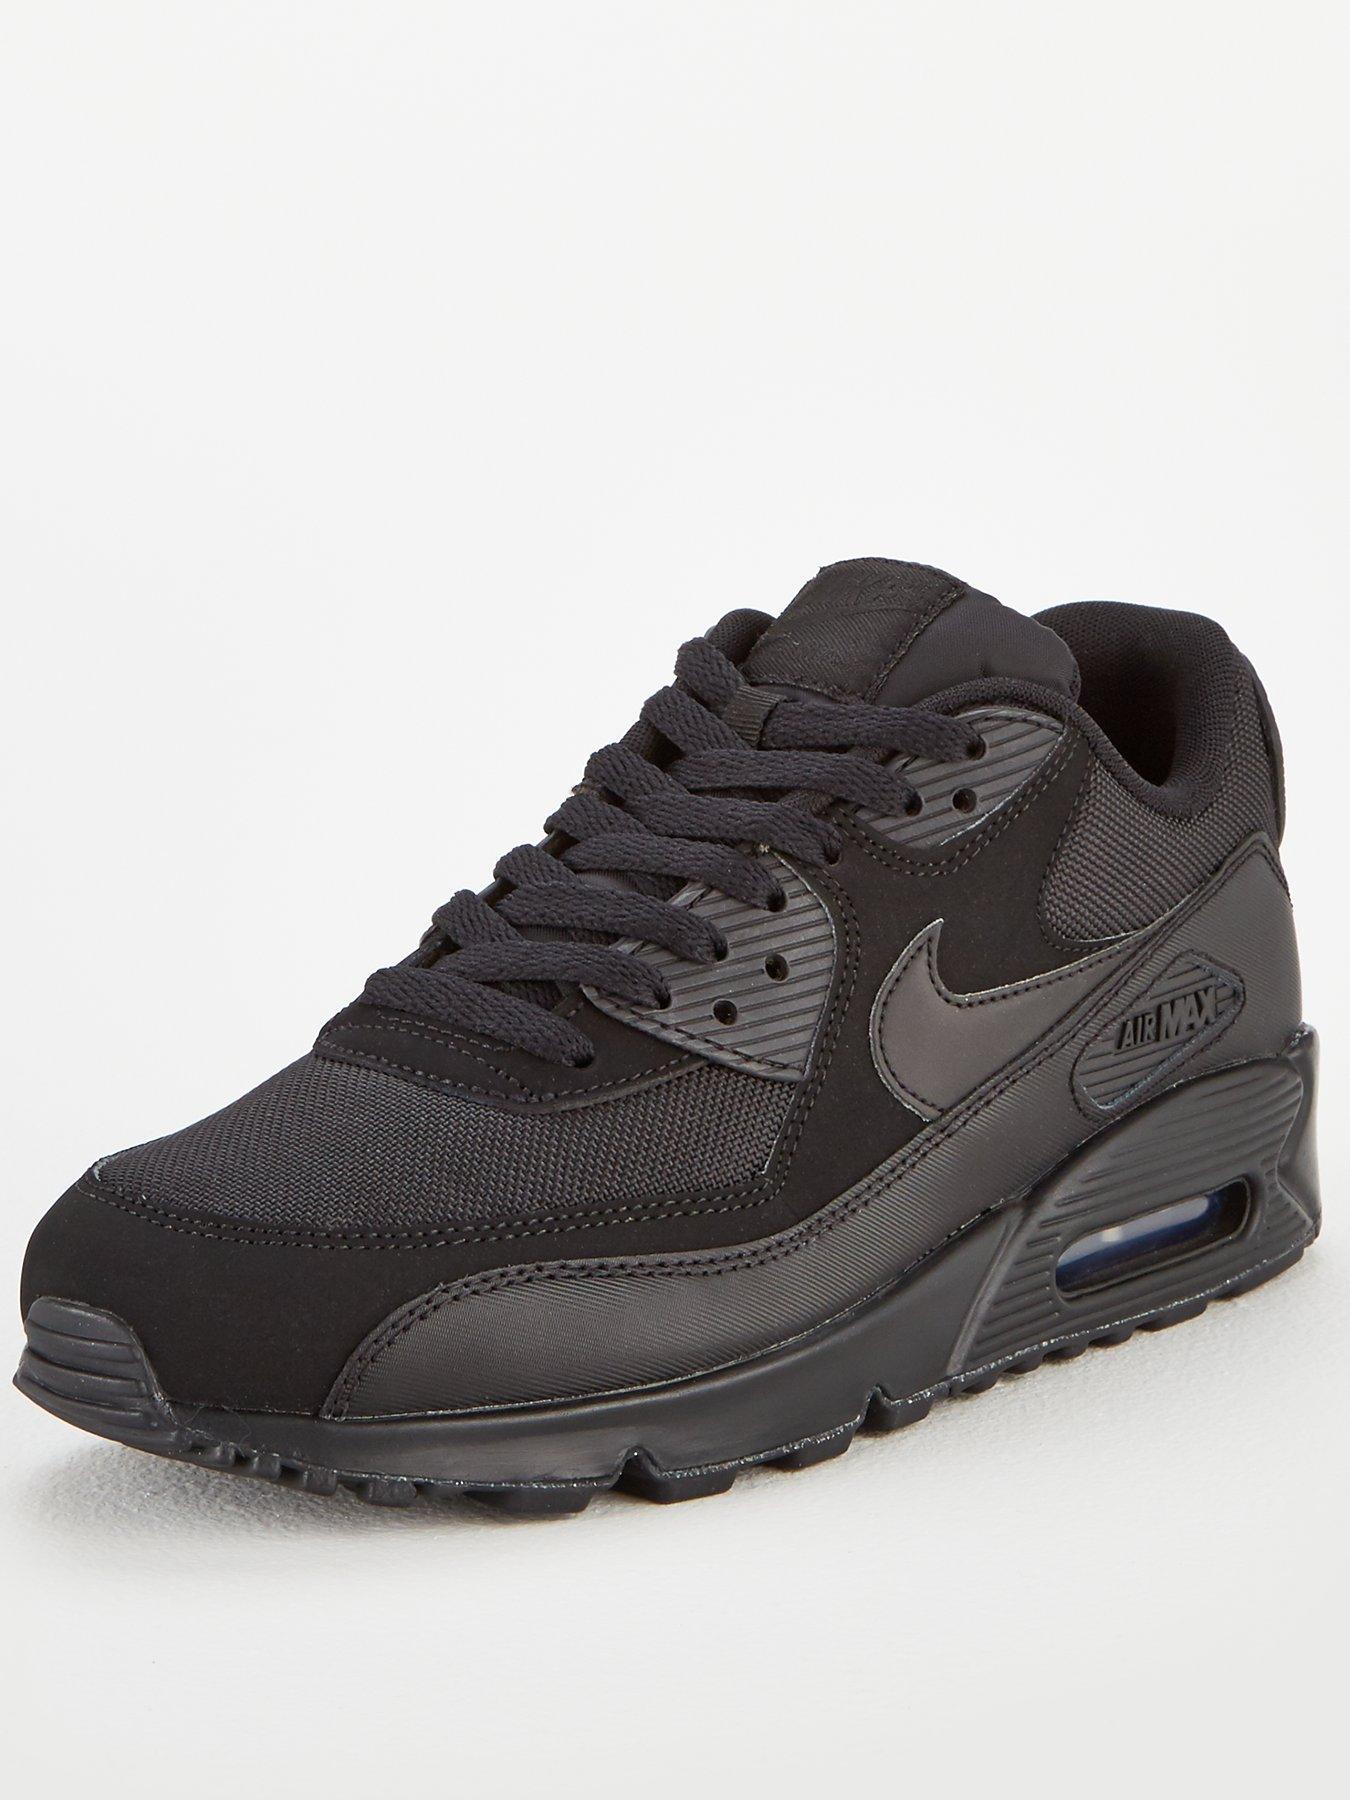 Nike Air Max 90 Ultra 514 910 Mens Trainers New In Nike UK